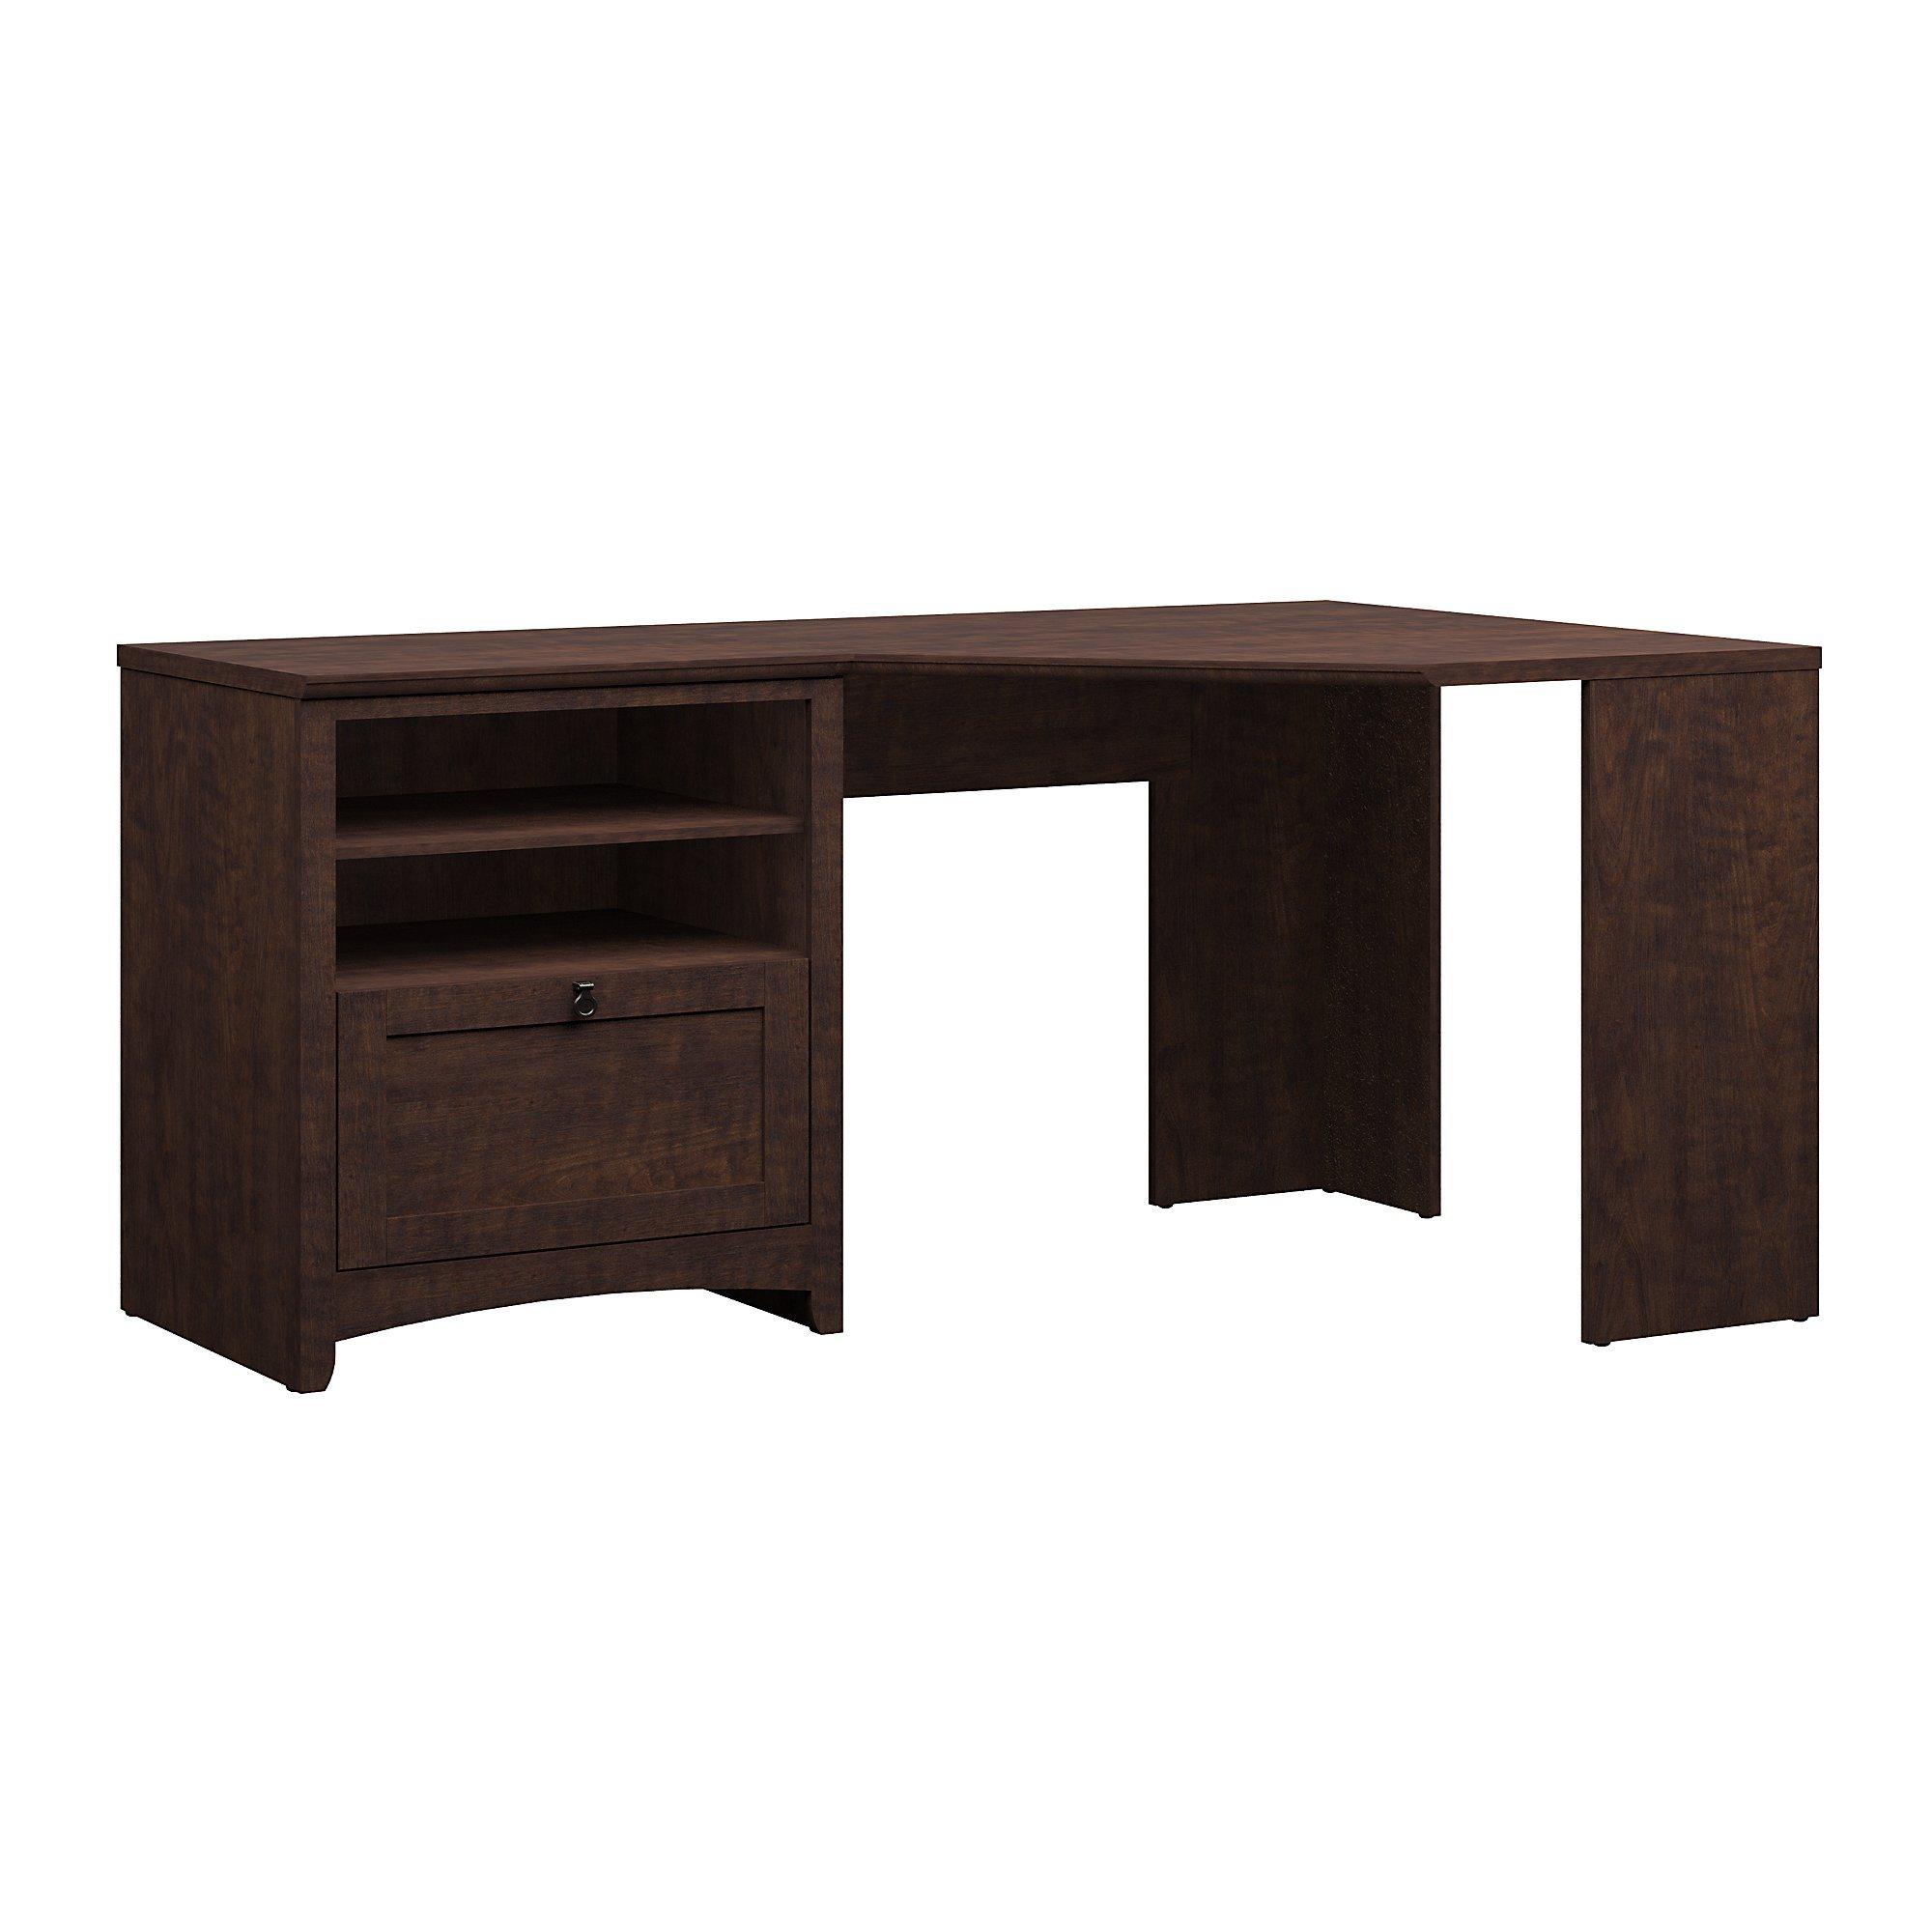 Bush Furniture Buena Vista 60W Corner Desk with Storage in Madison Cherry by Bush Furniture